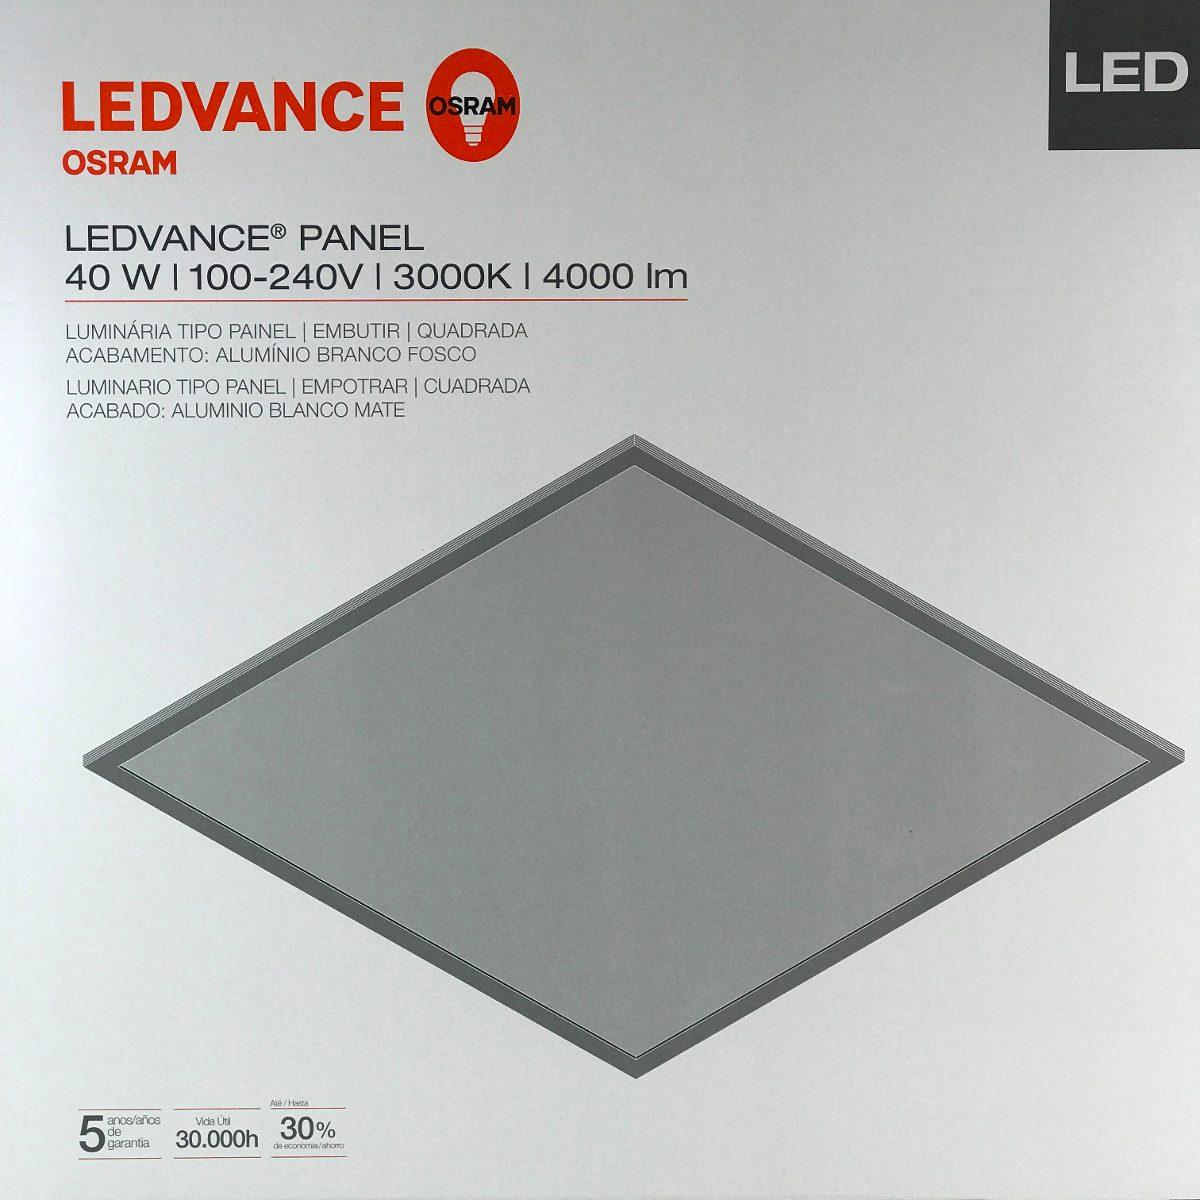 Full Size of Osram Led Panel 32w (1200 X 300mm) 600x600 Light 60x60 List Planon Pure 300x600mm Frameless 600x600mm Plus 60x30cm (600 600mm) Surface Mount Kit Ledvance 40w Wohnzimmer Osram Led Panel